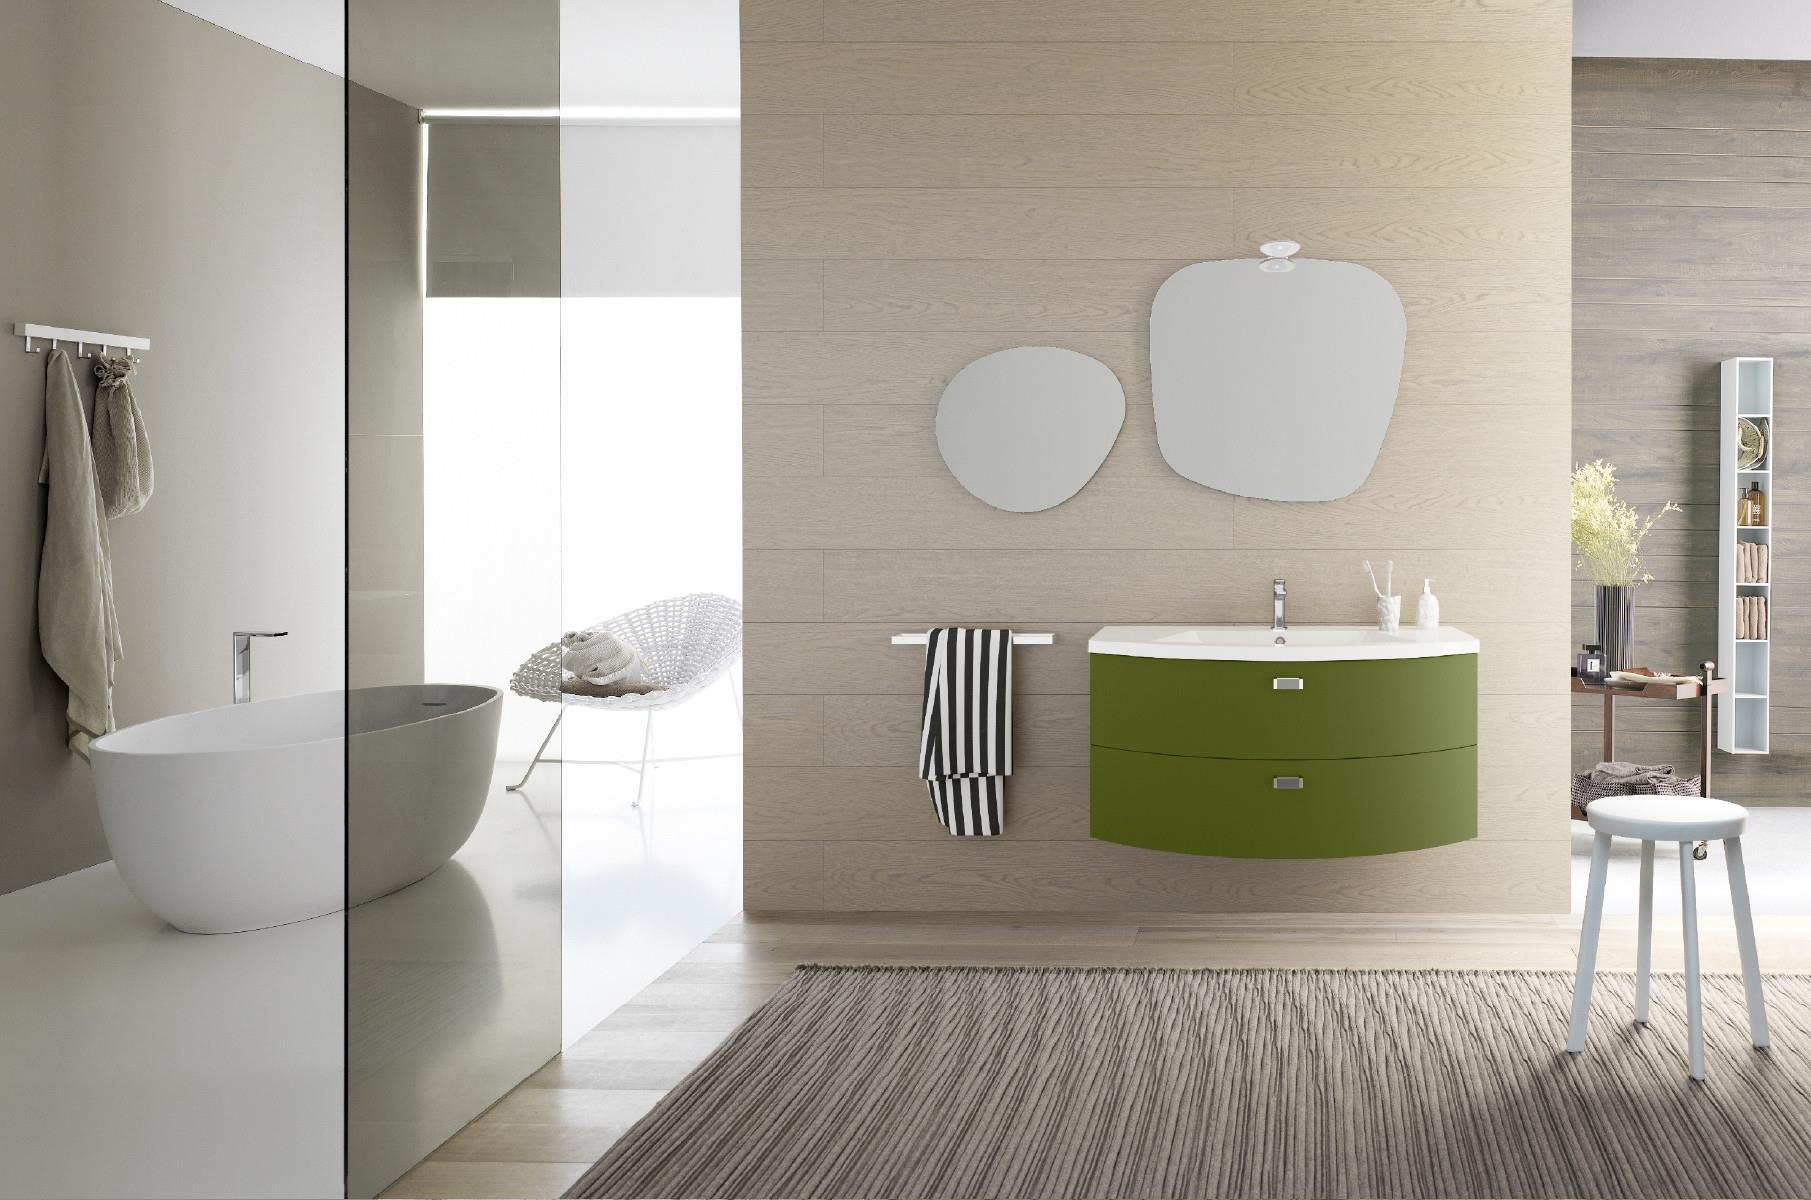 Sanitari & arredo bagno alto adige lime mobili da bagno di